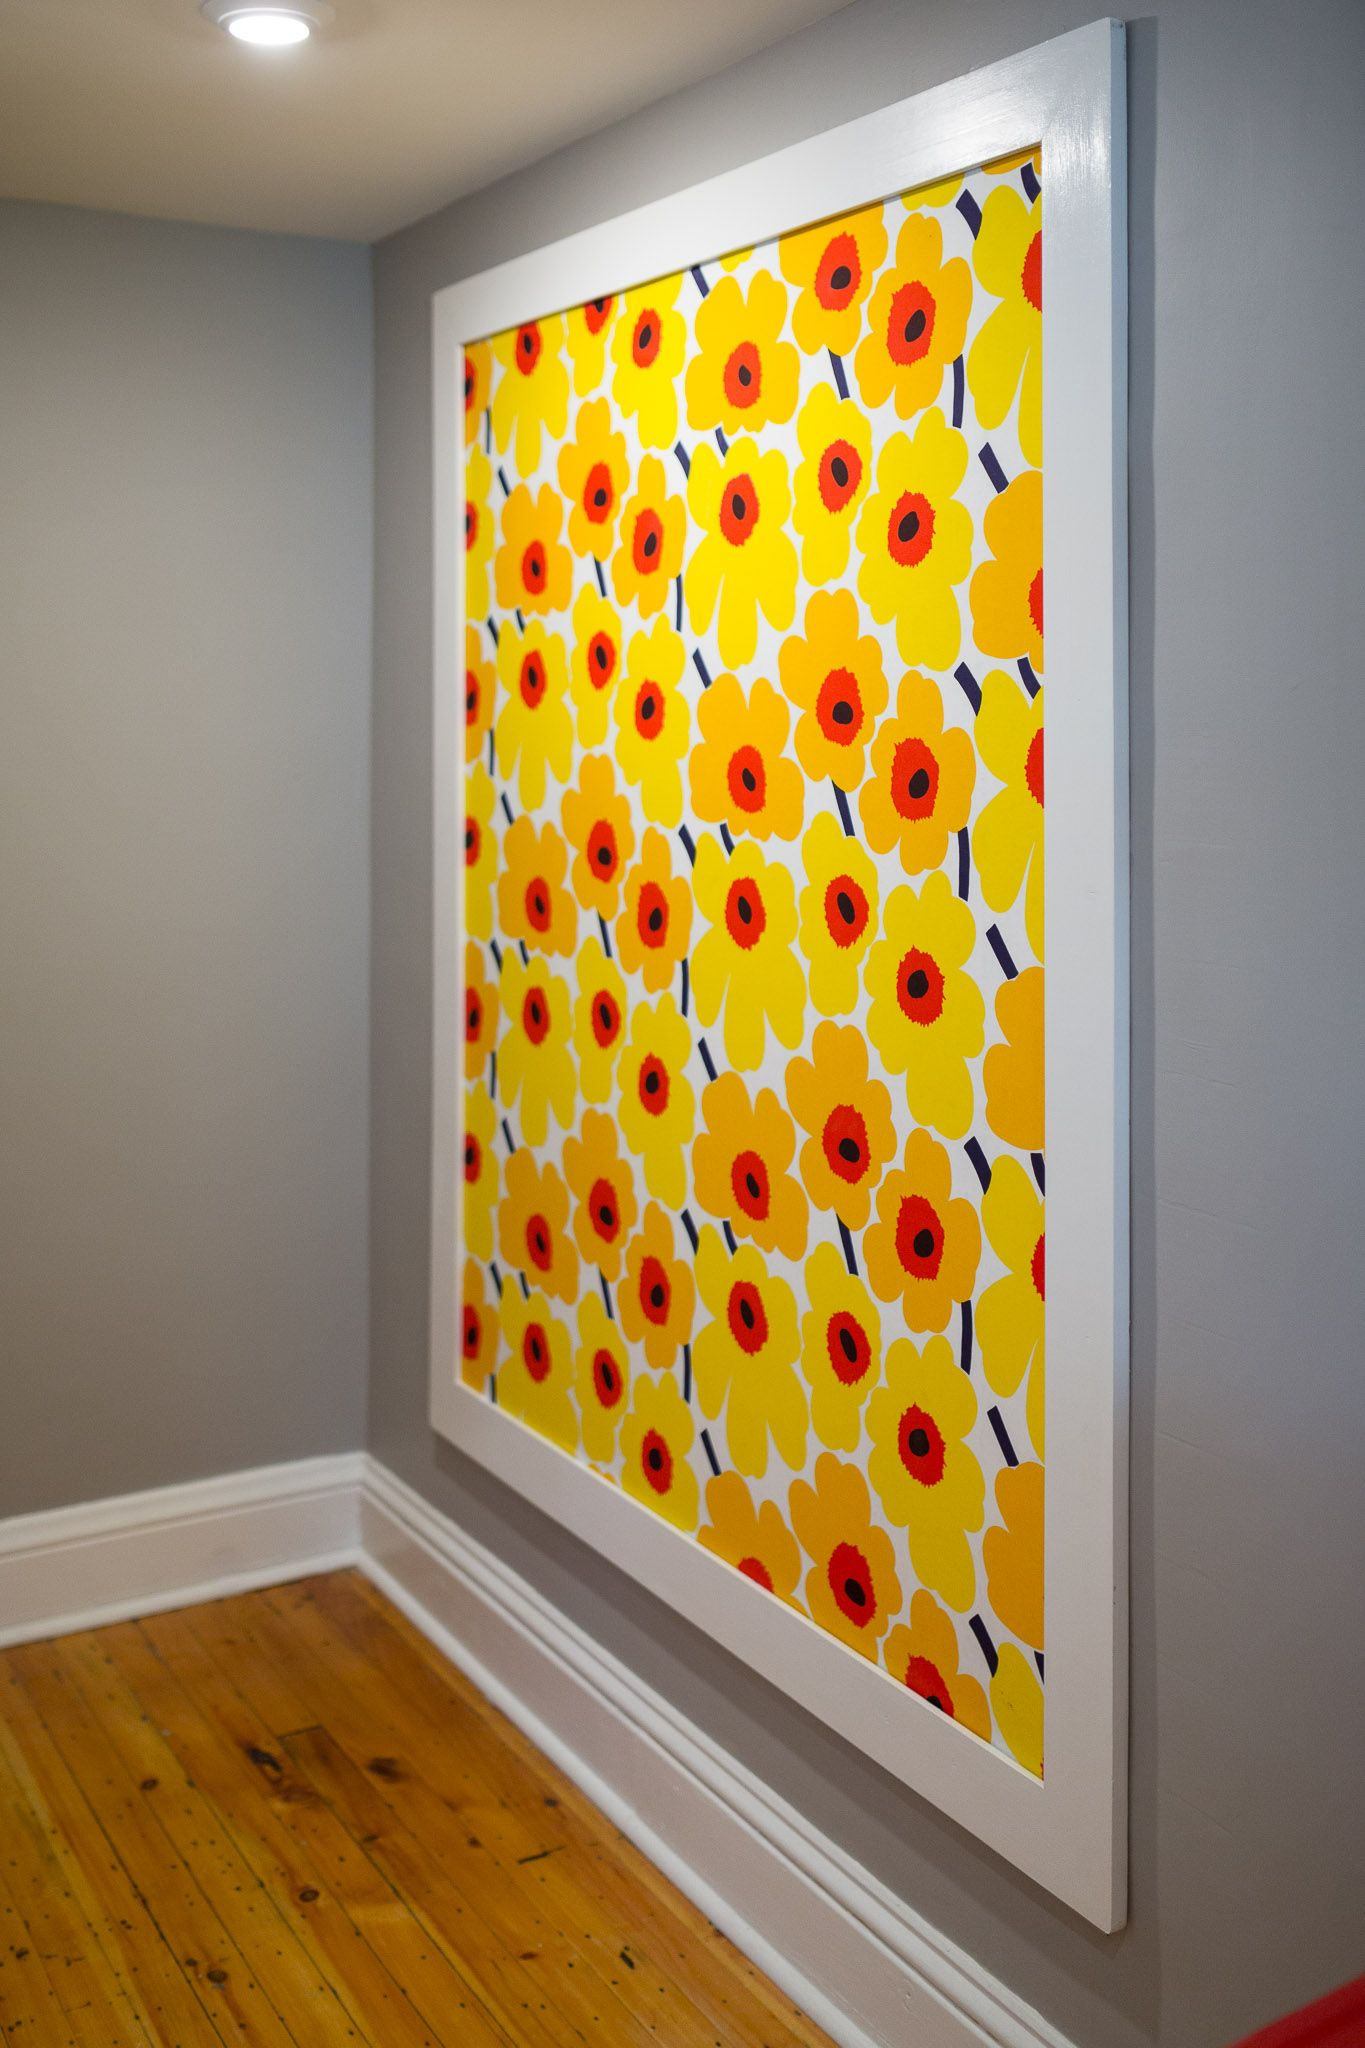 Marimekko fabric covers this huge cork board - art and organization ...